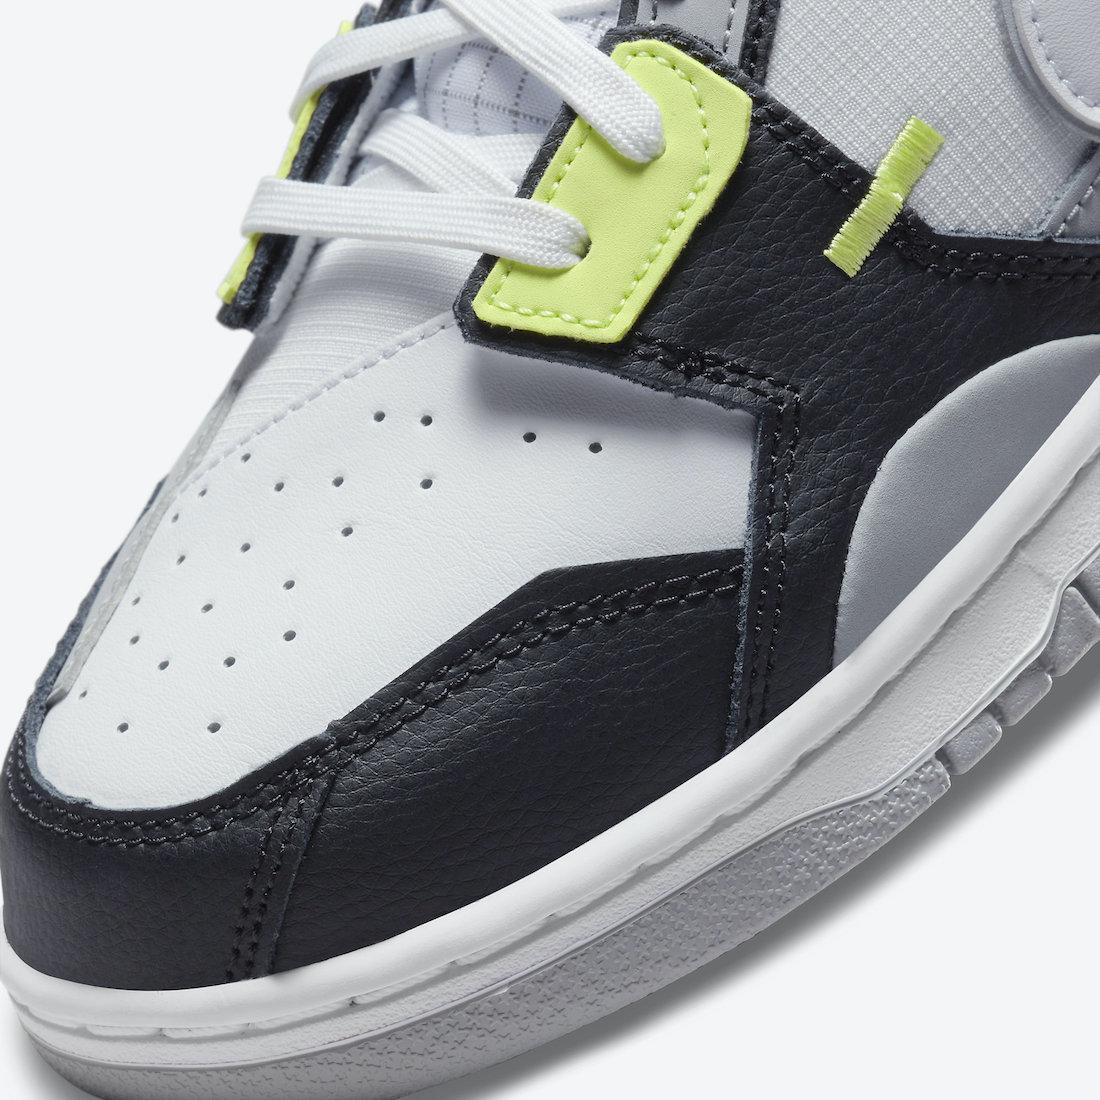 Nike Dunk Low, Nike Dunk, NIKE, Dunk Low, Dunk, Black